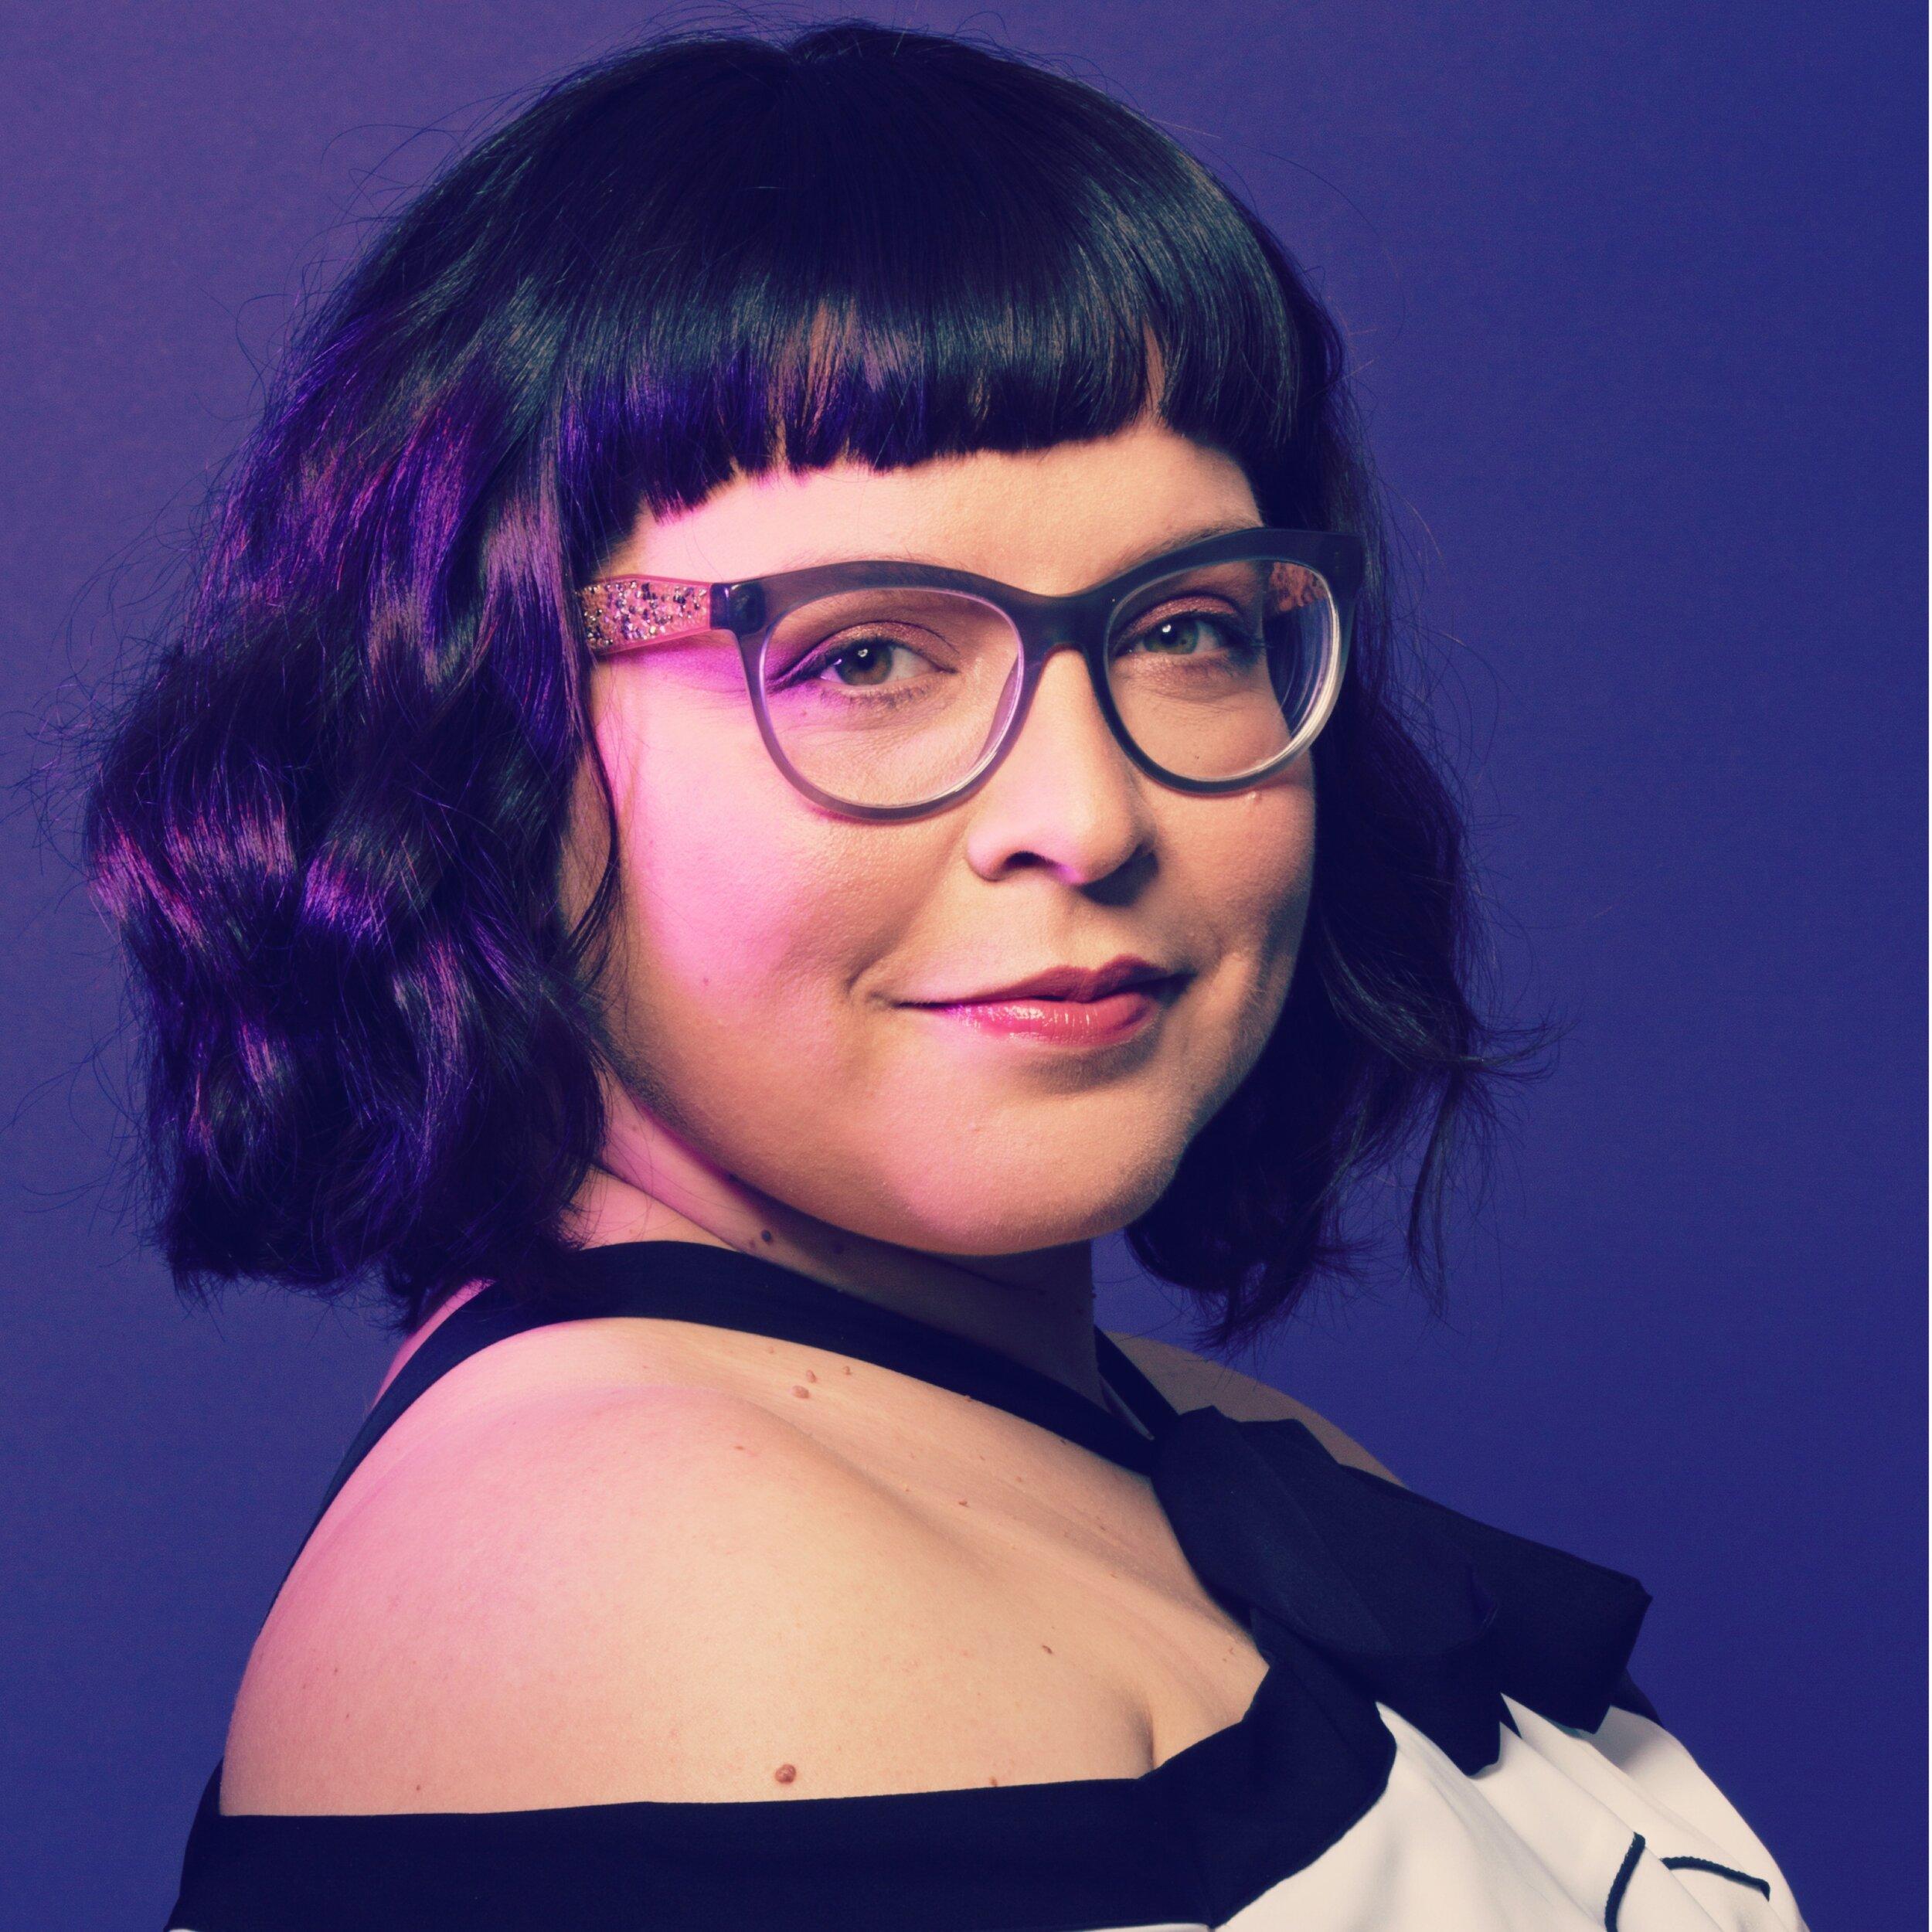 Jess Morales Rocketto